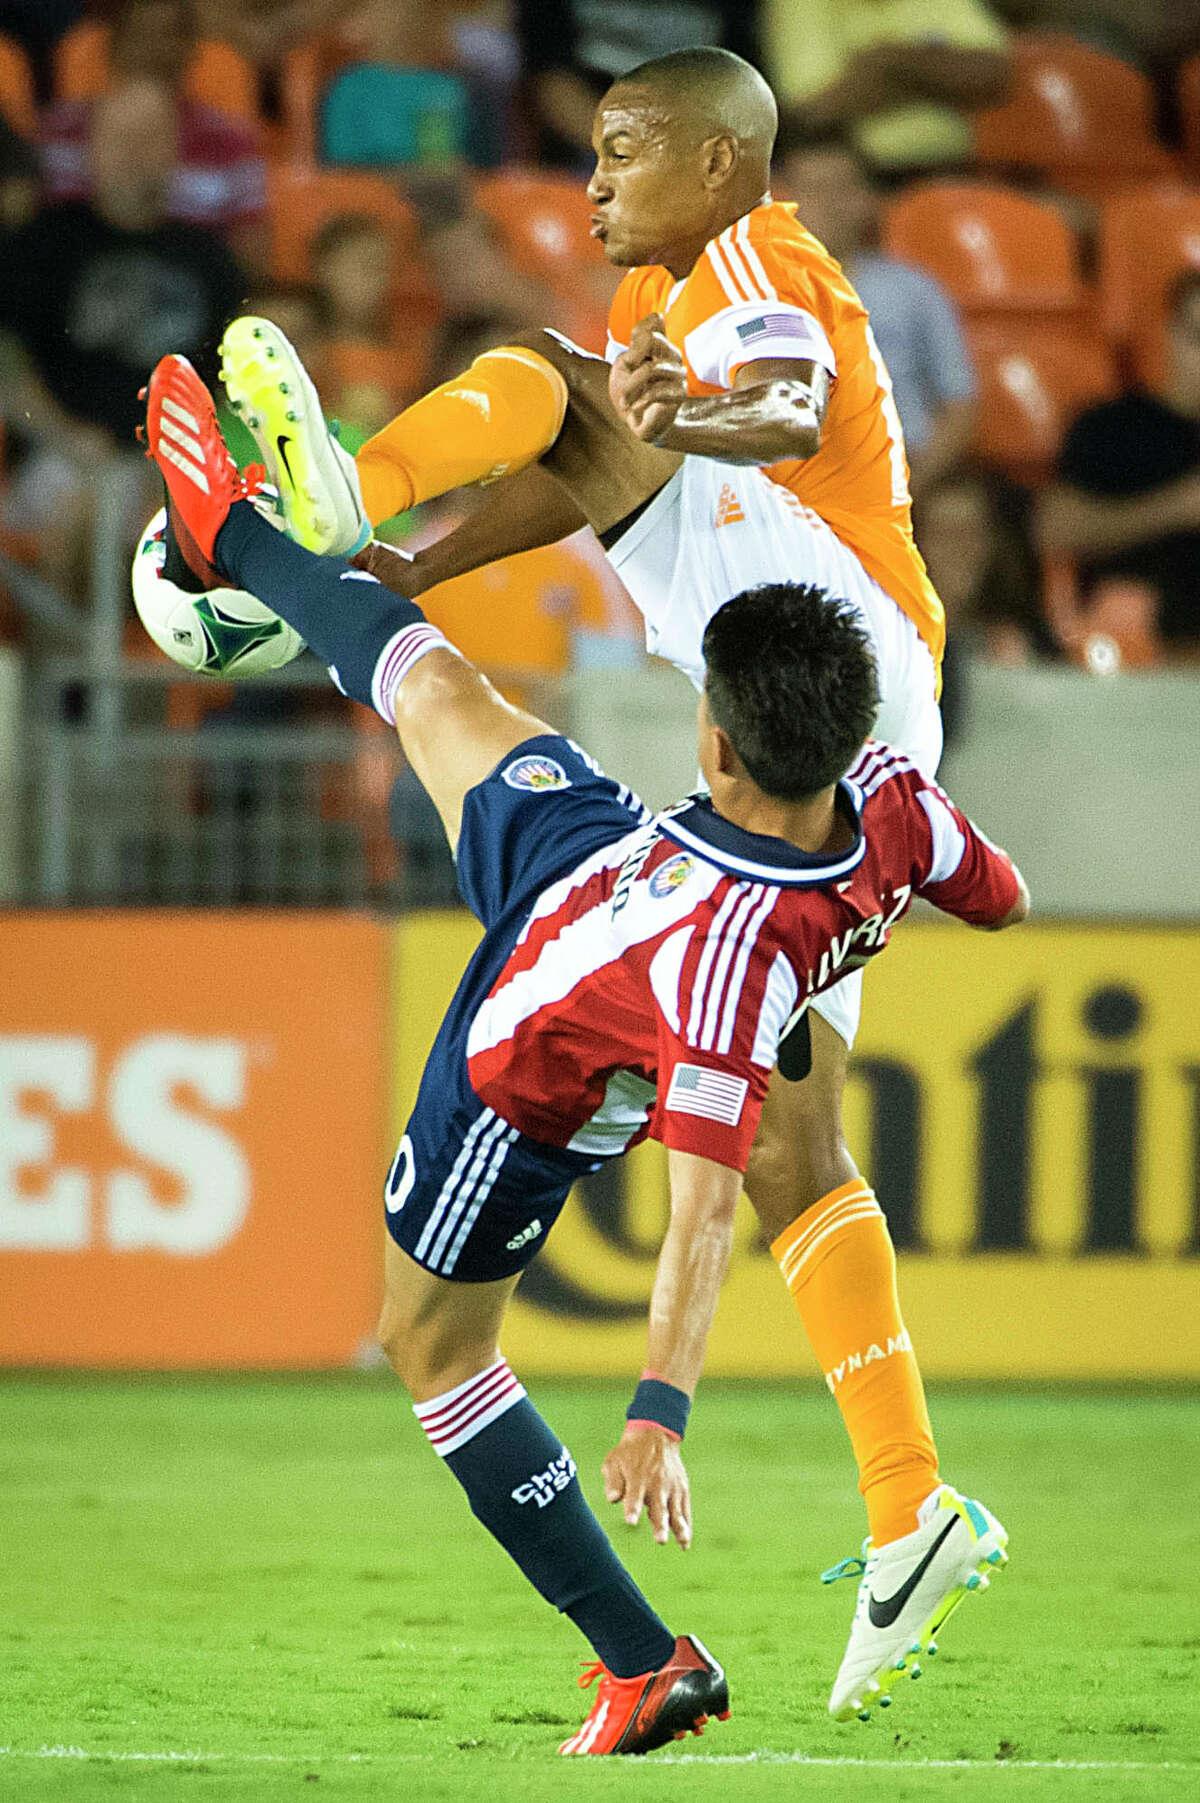 Dynamo midfielder Ricardo Clark fights for the ball against Chivas USA midfielder Carlos Alvarez.